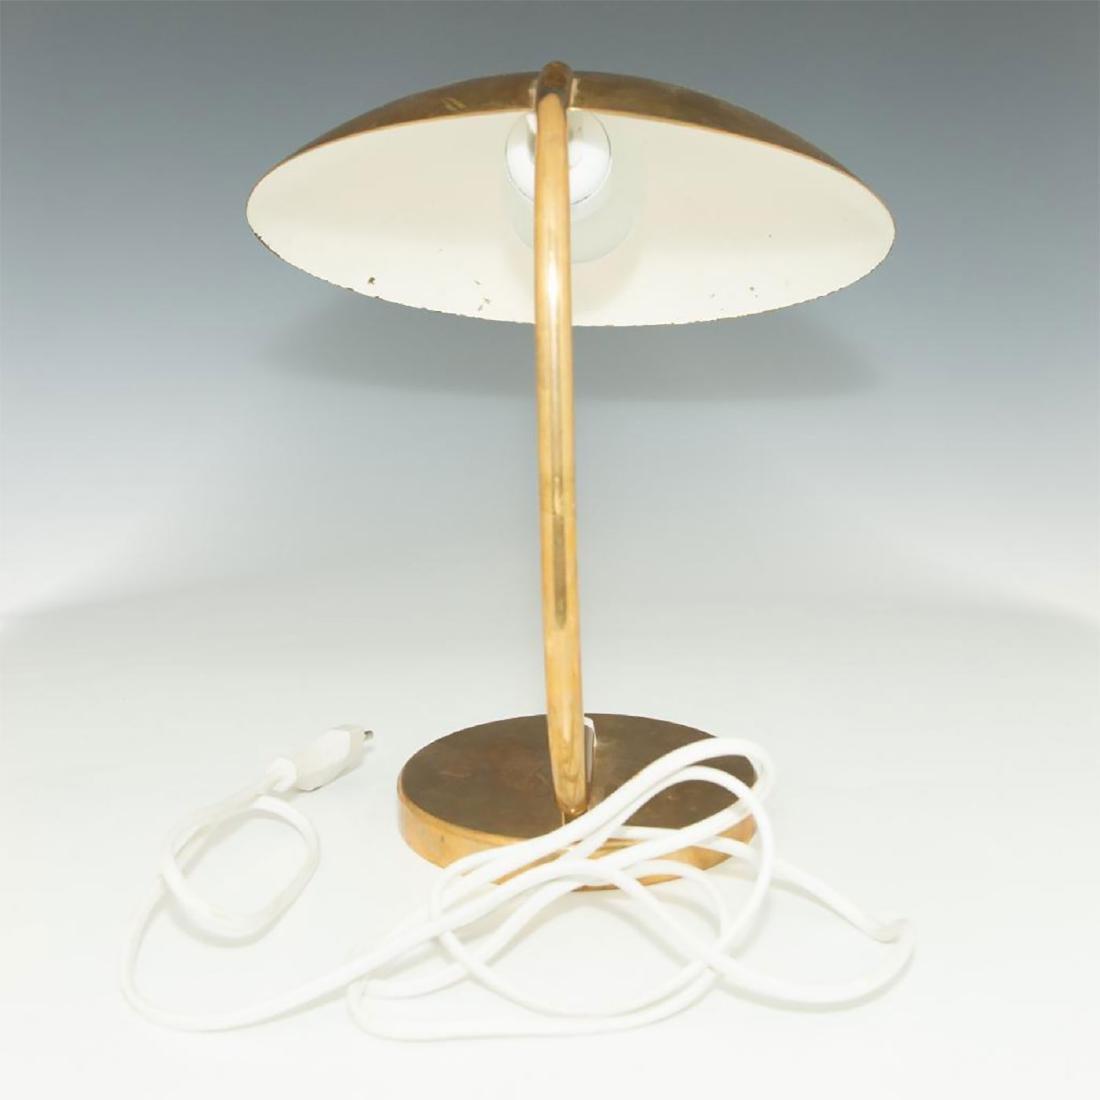 ITSU MADE FINNISH MID-CENTURY MODERN DESK LAMP - 3